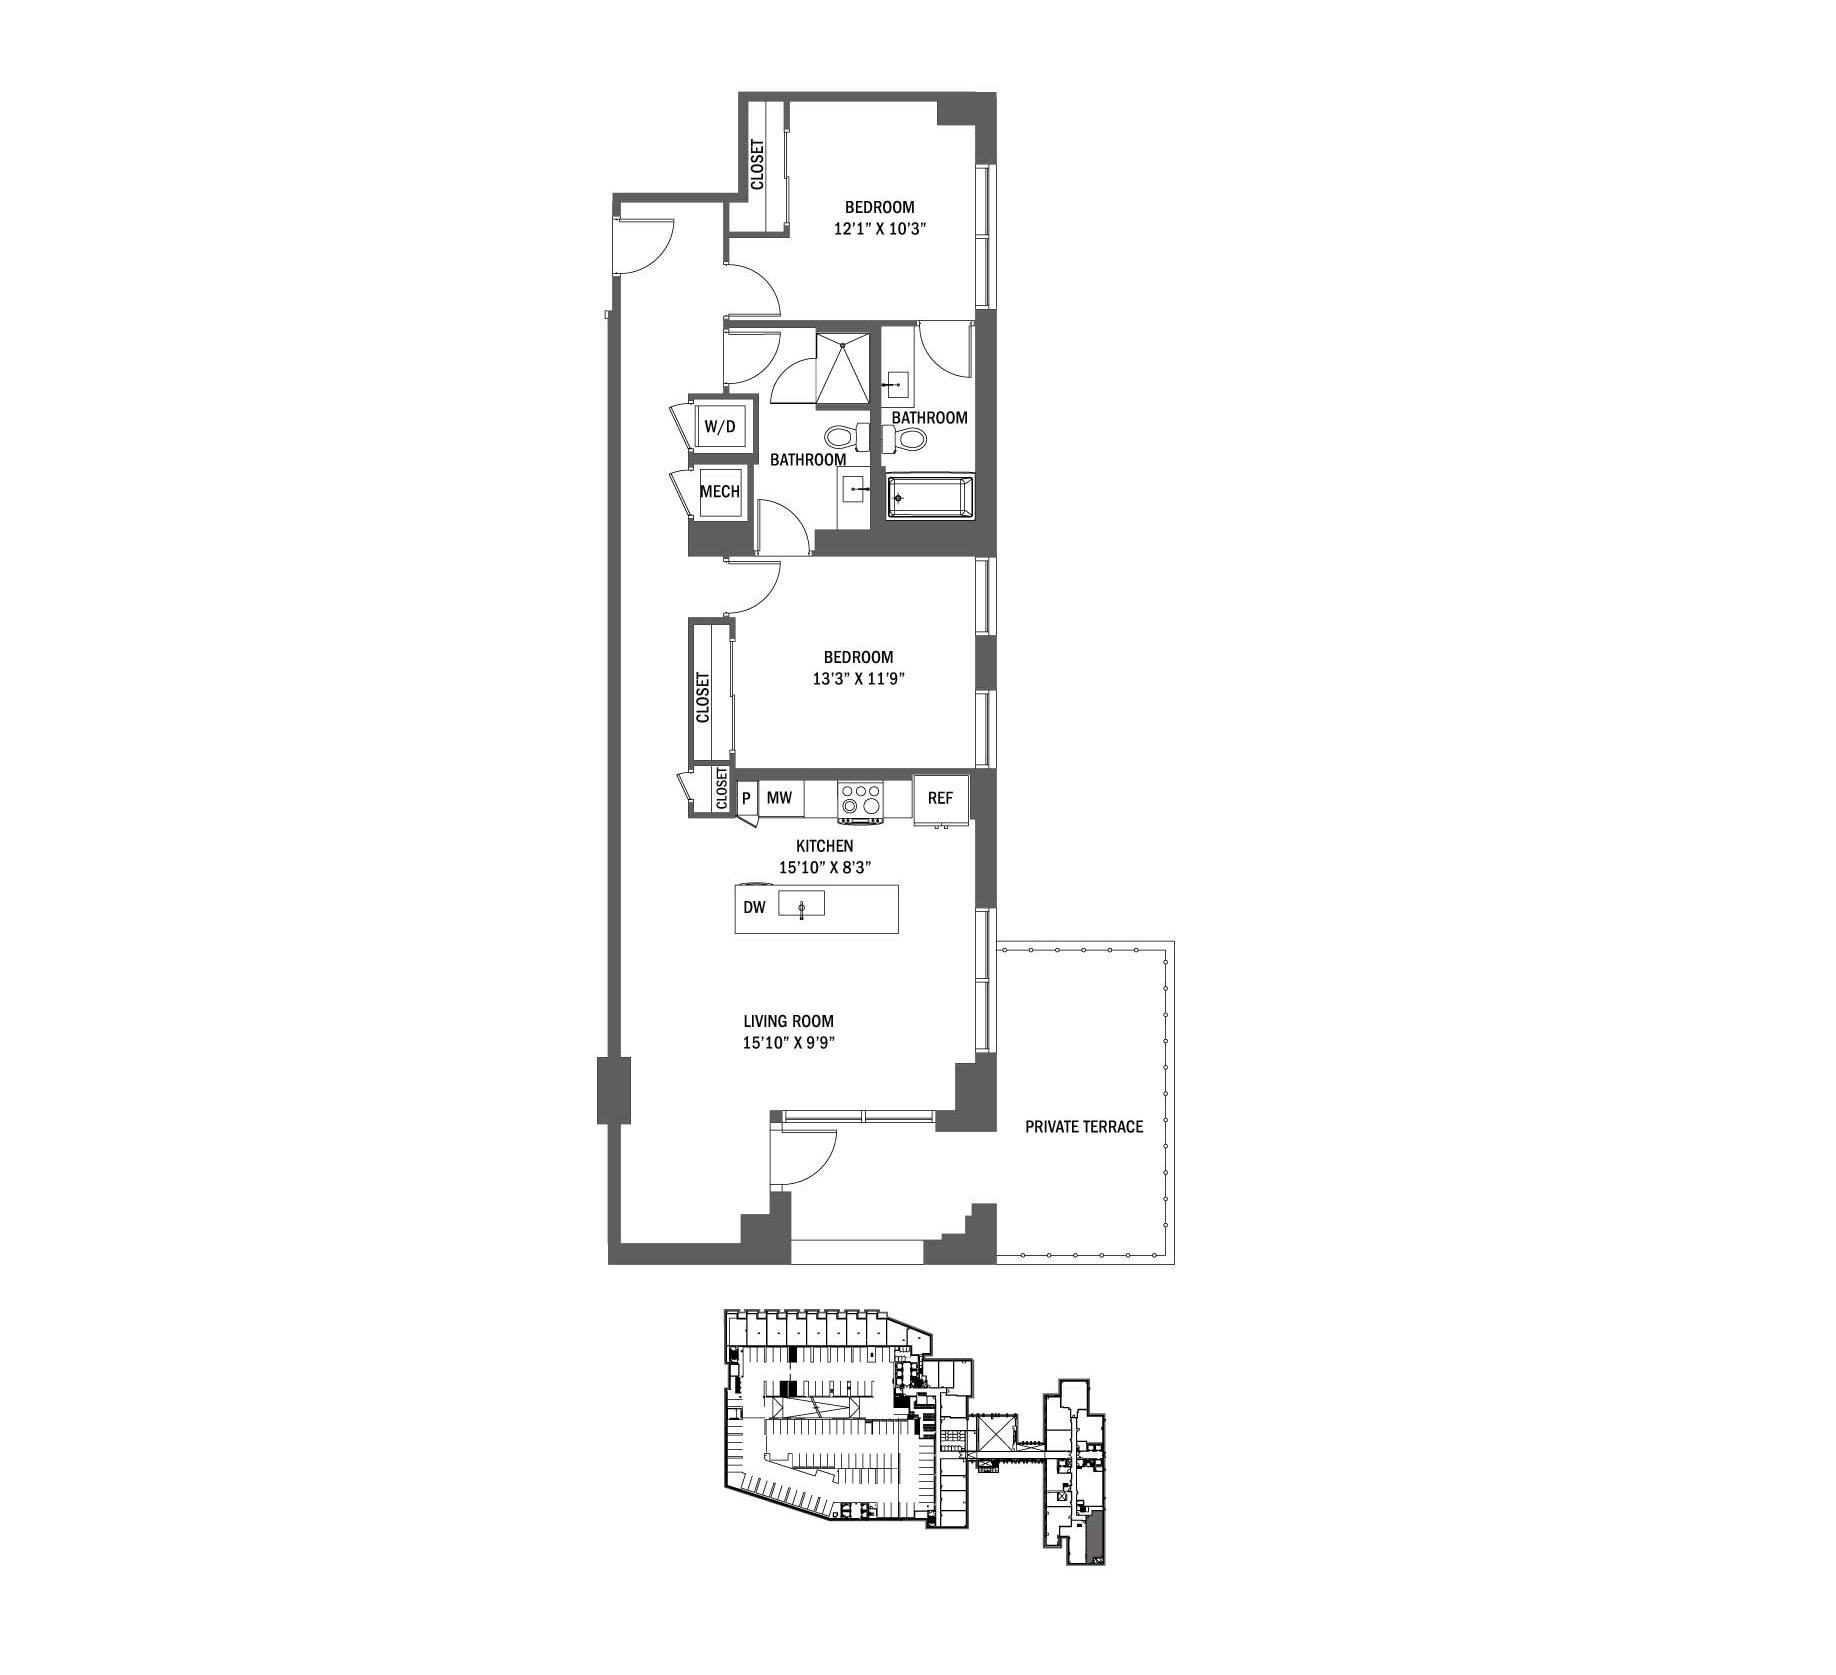 P0625338 789bc14 e10 02p 2 floorplan